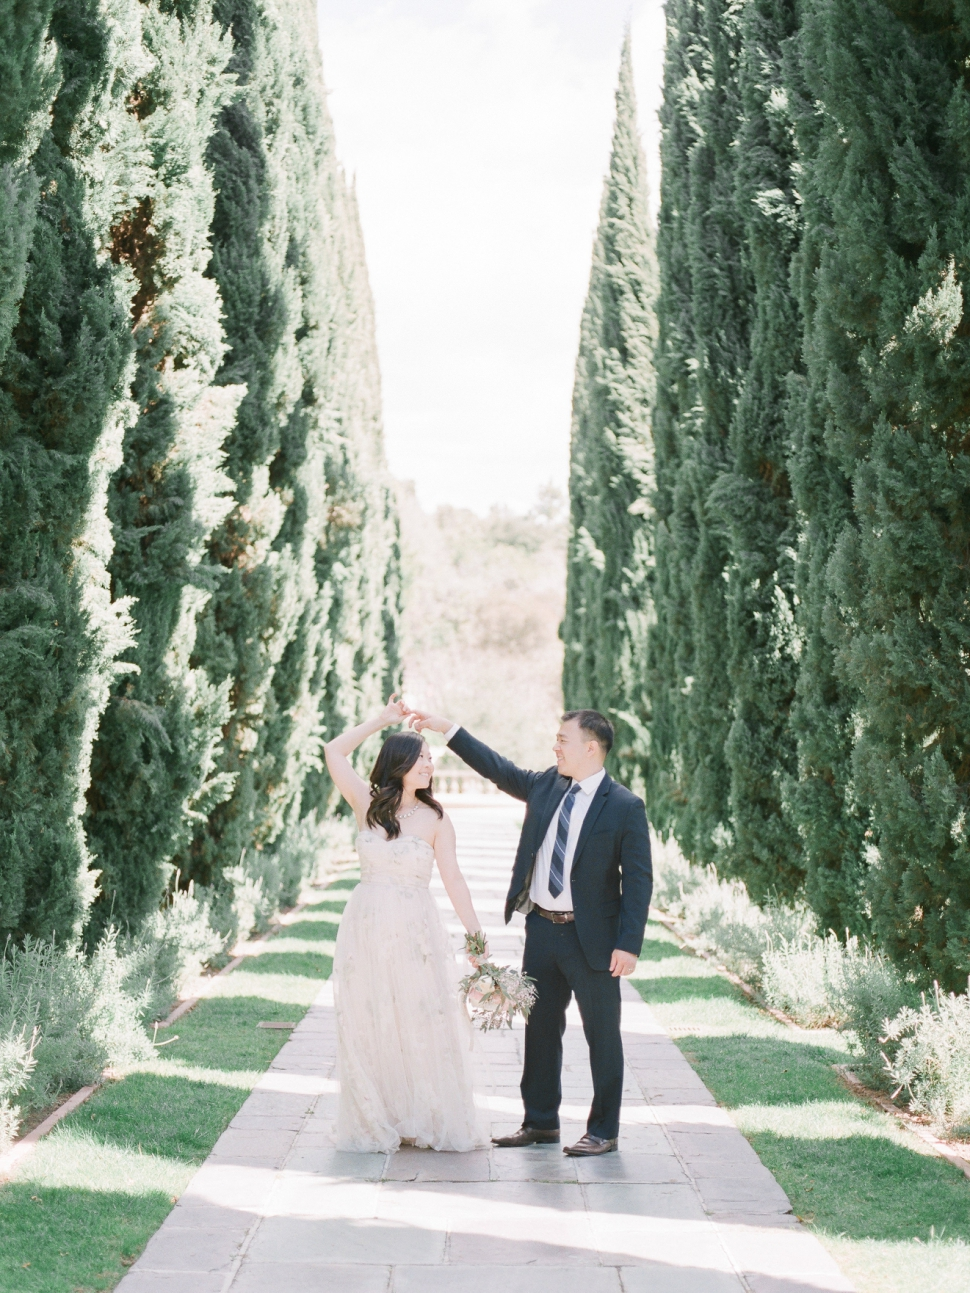 Southern-California-Wedding-Photographer-Cassi-Claire-Greystone-Mansion-Beverly-Hills-CA-wedding_07.jpg